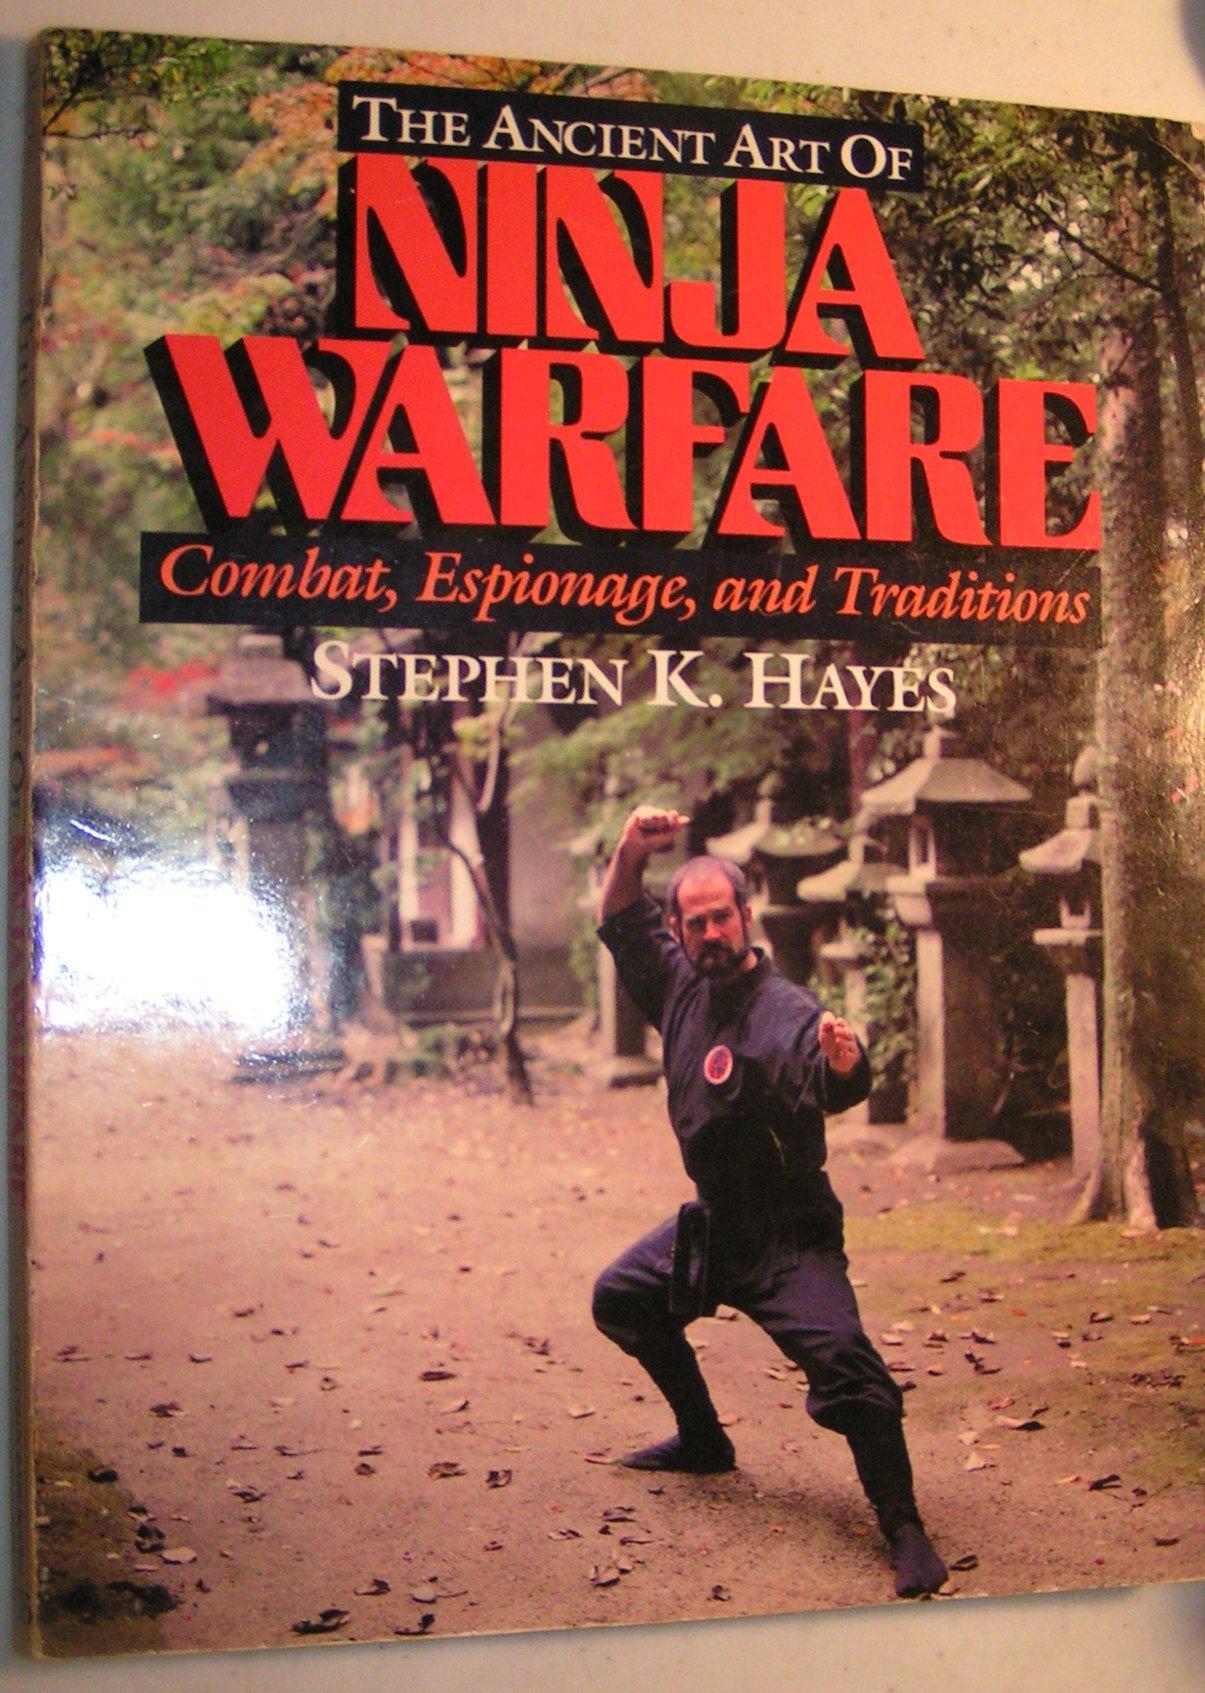 The Ancient Art of Ninja Warfare: Combat, Espionage and ...